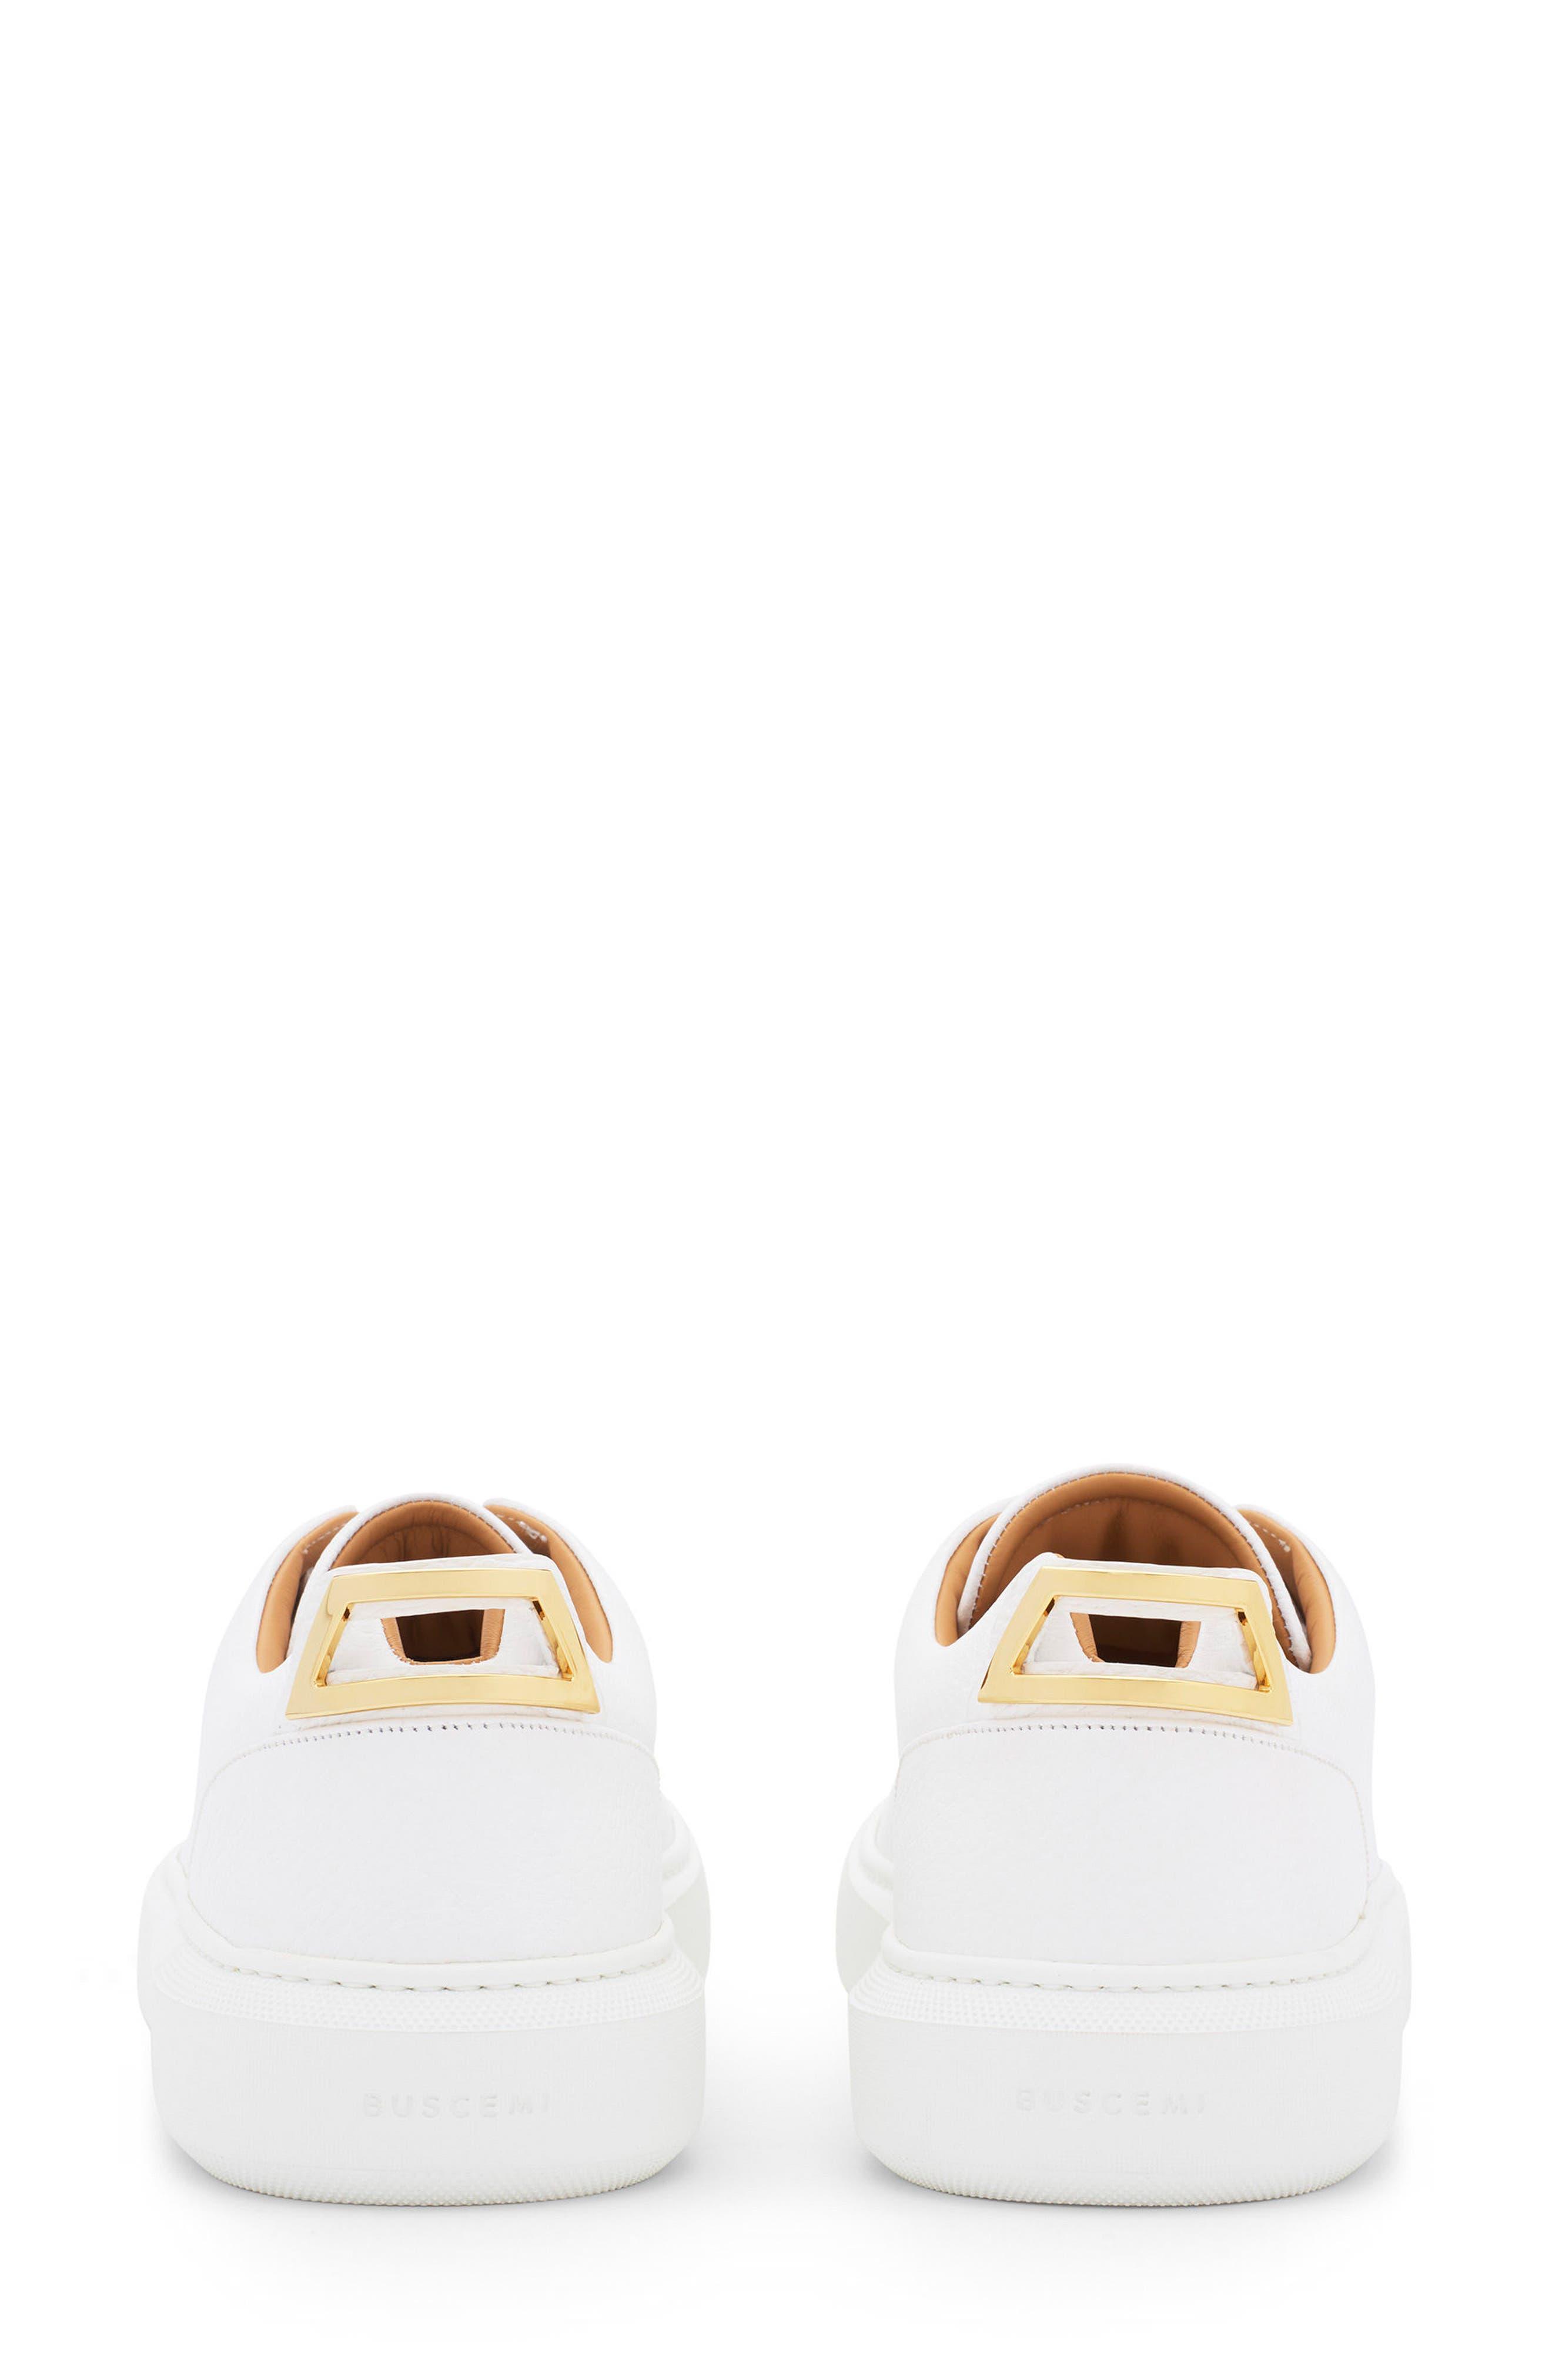 Uno Low Top Sneaker,                             Alternate thumbnail 2, color,                             100